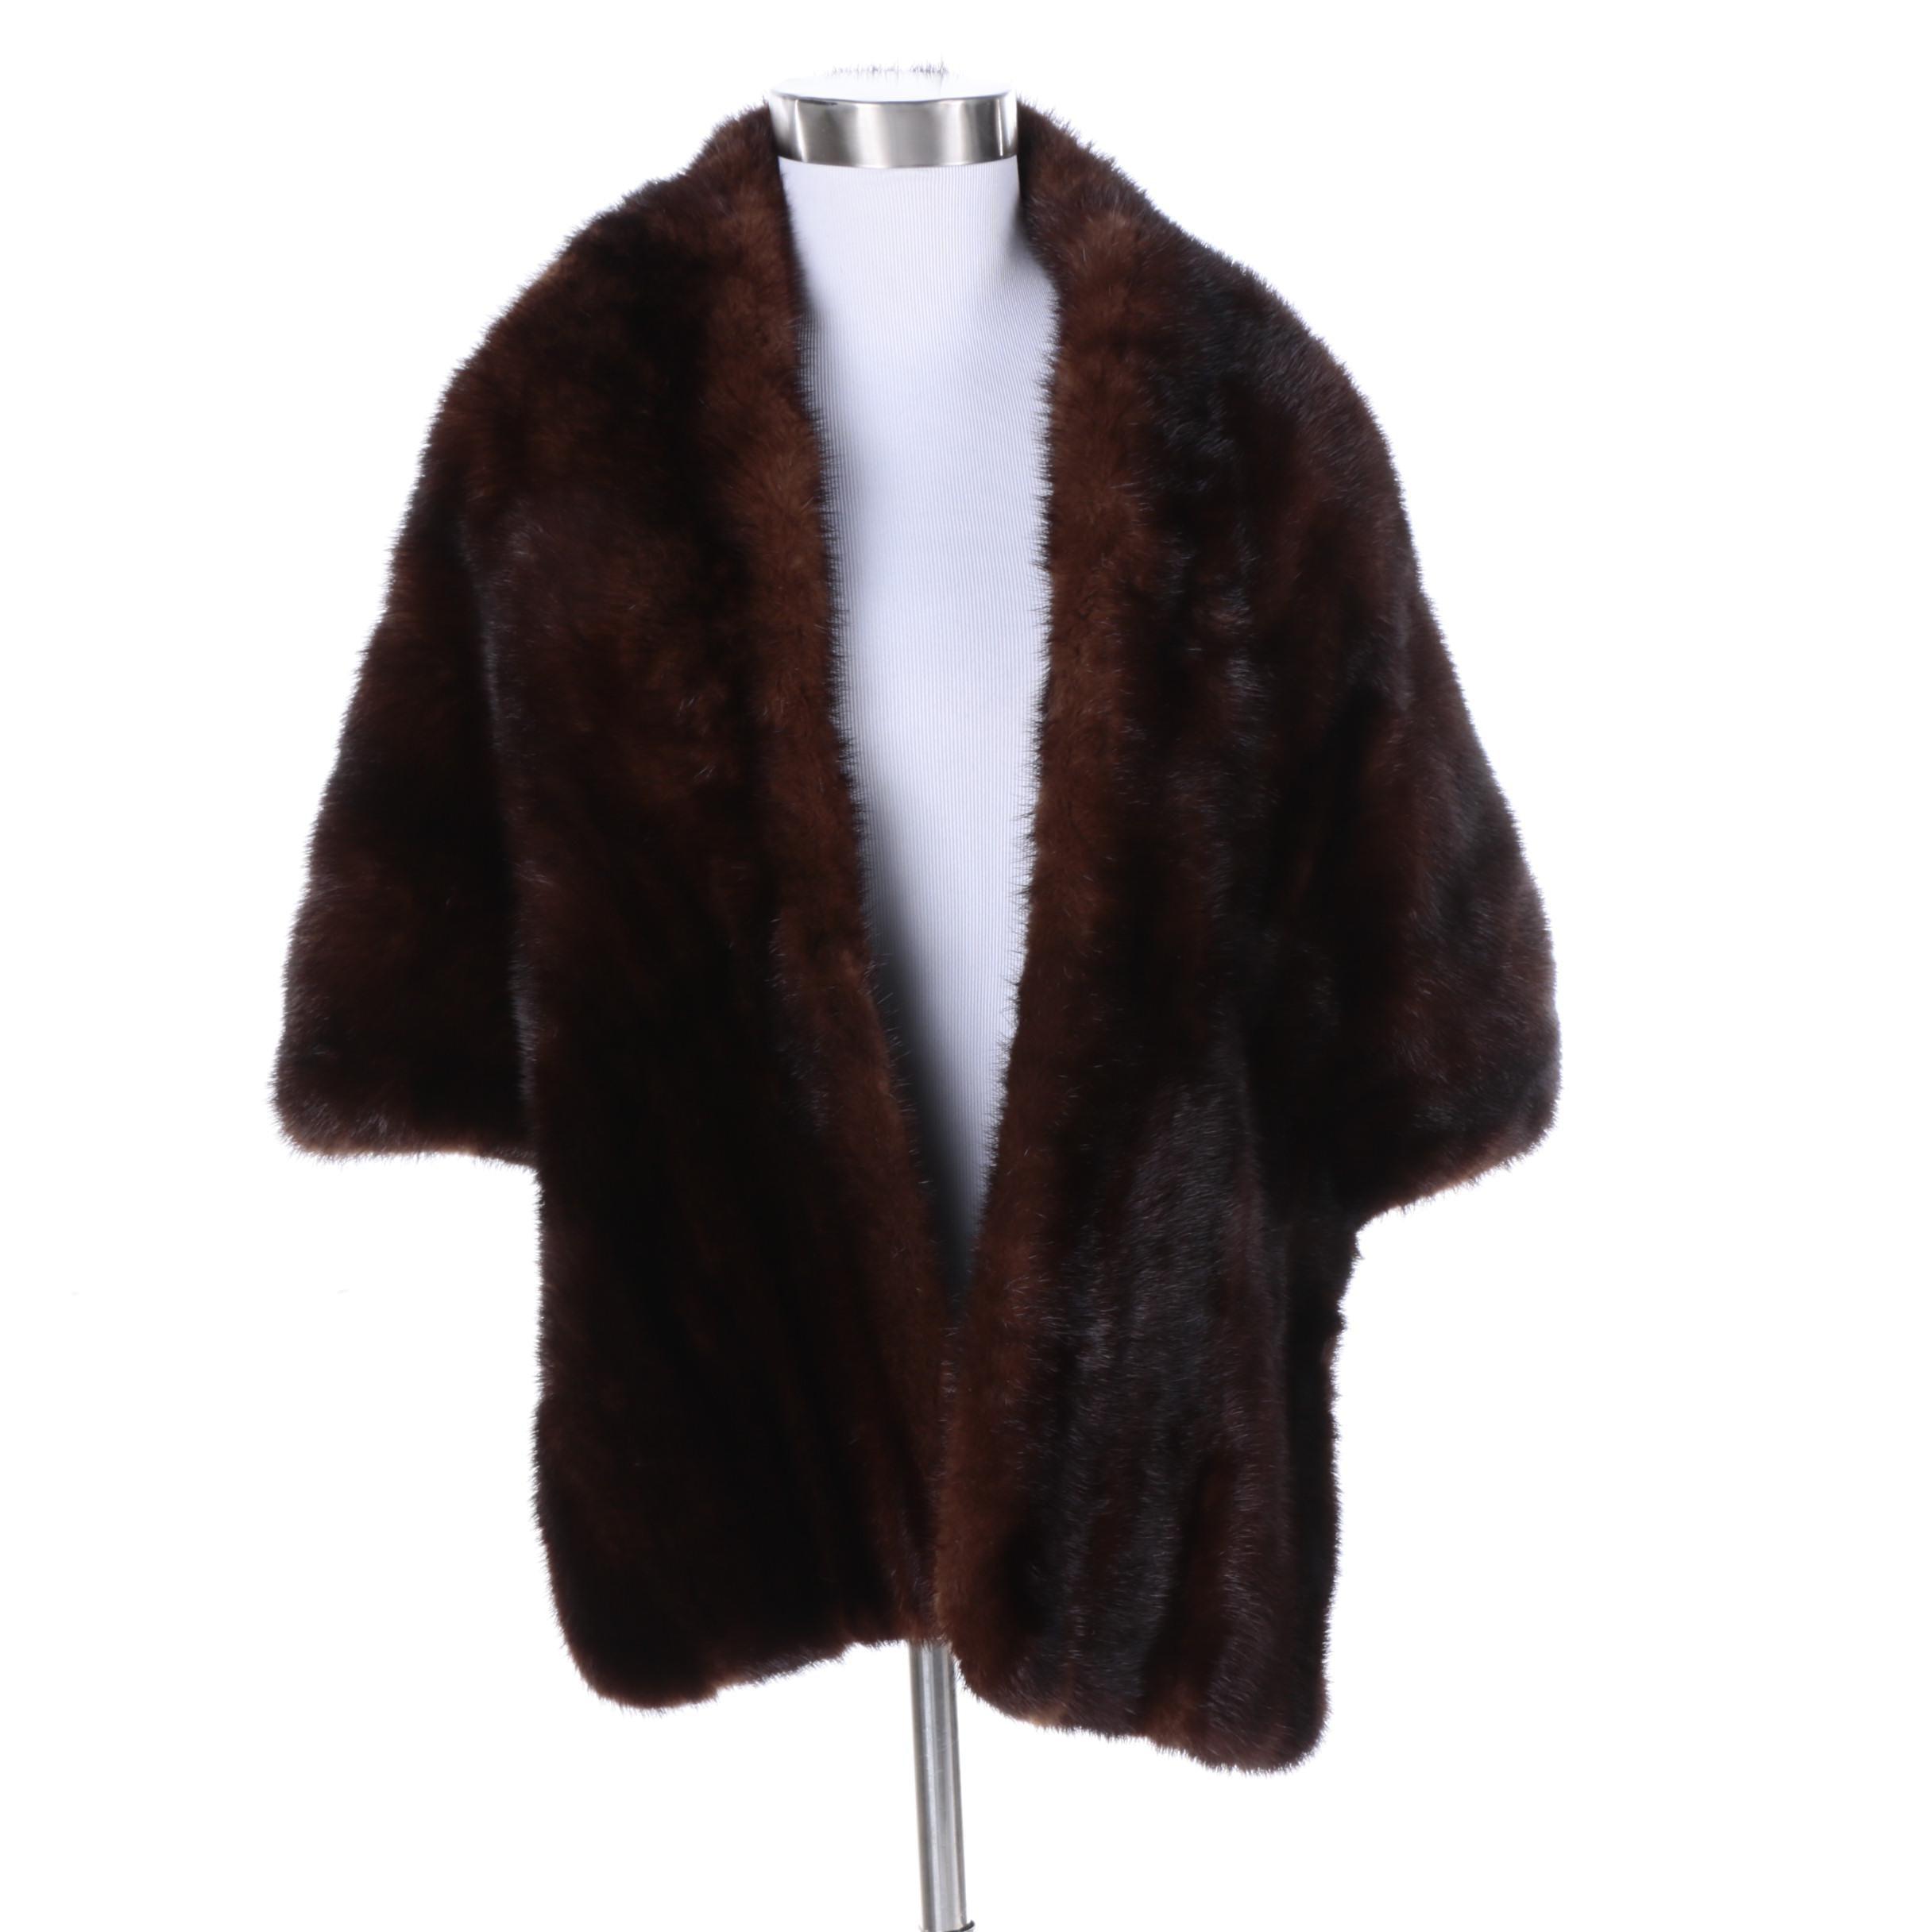 Vintage Pels Backer of Oslo Dark Mahogany Brown Mink Fur Stole